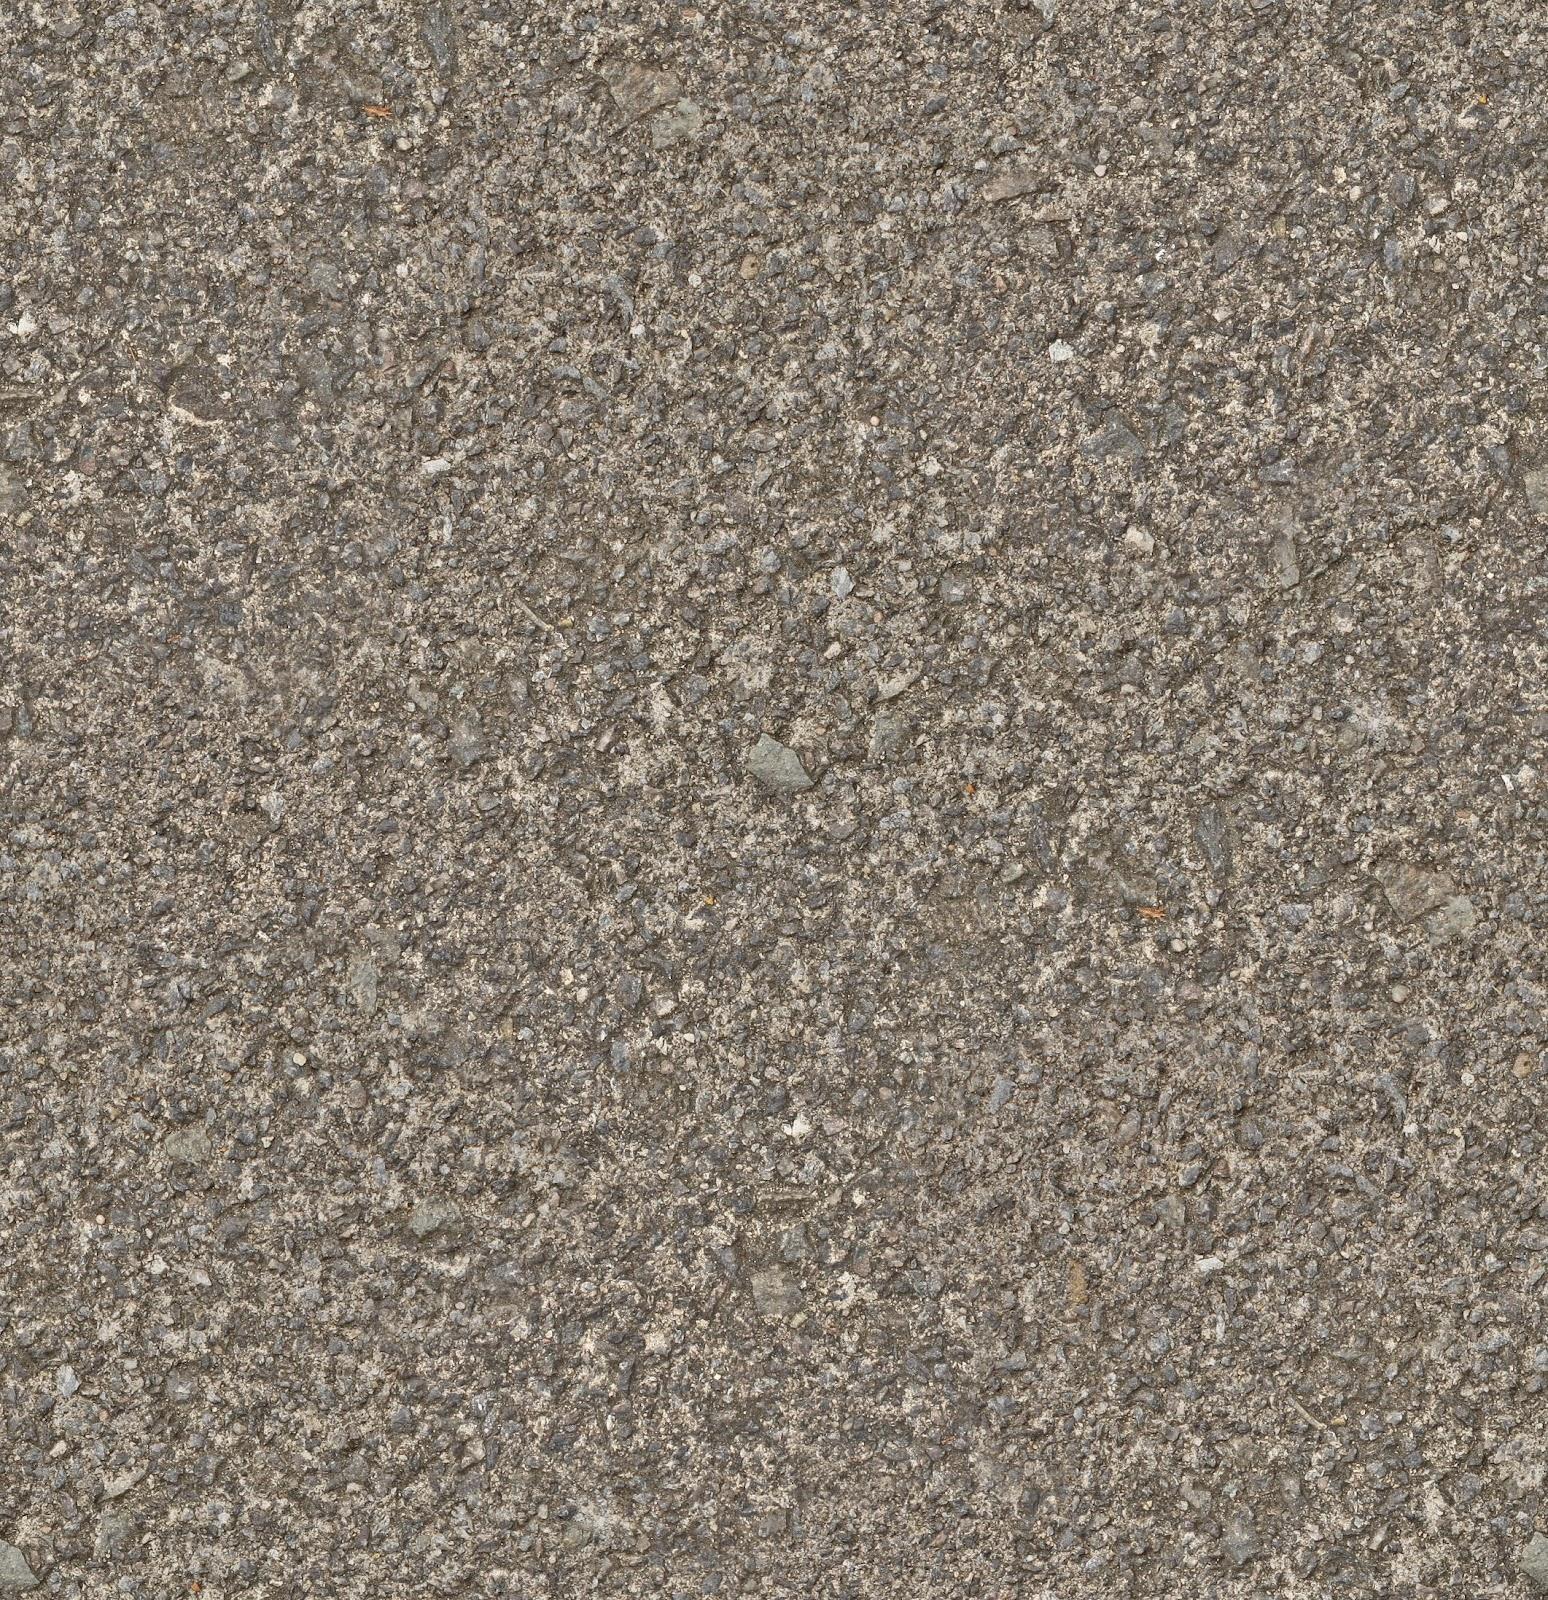 High Resolution Seamless Textures Free Seamless Concrete